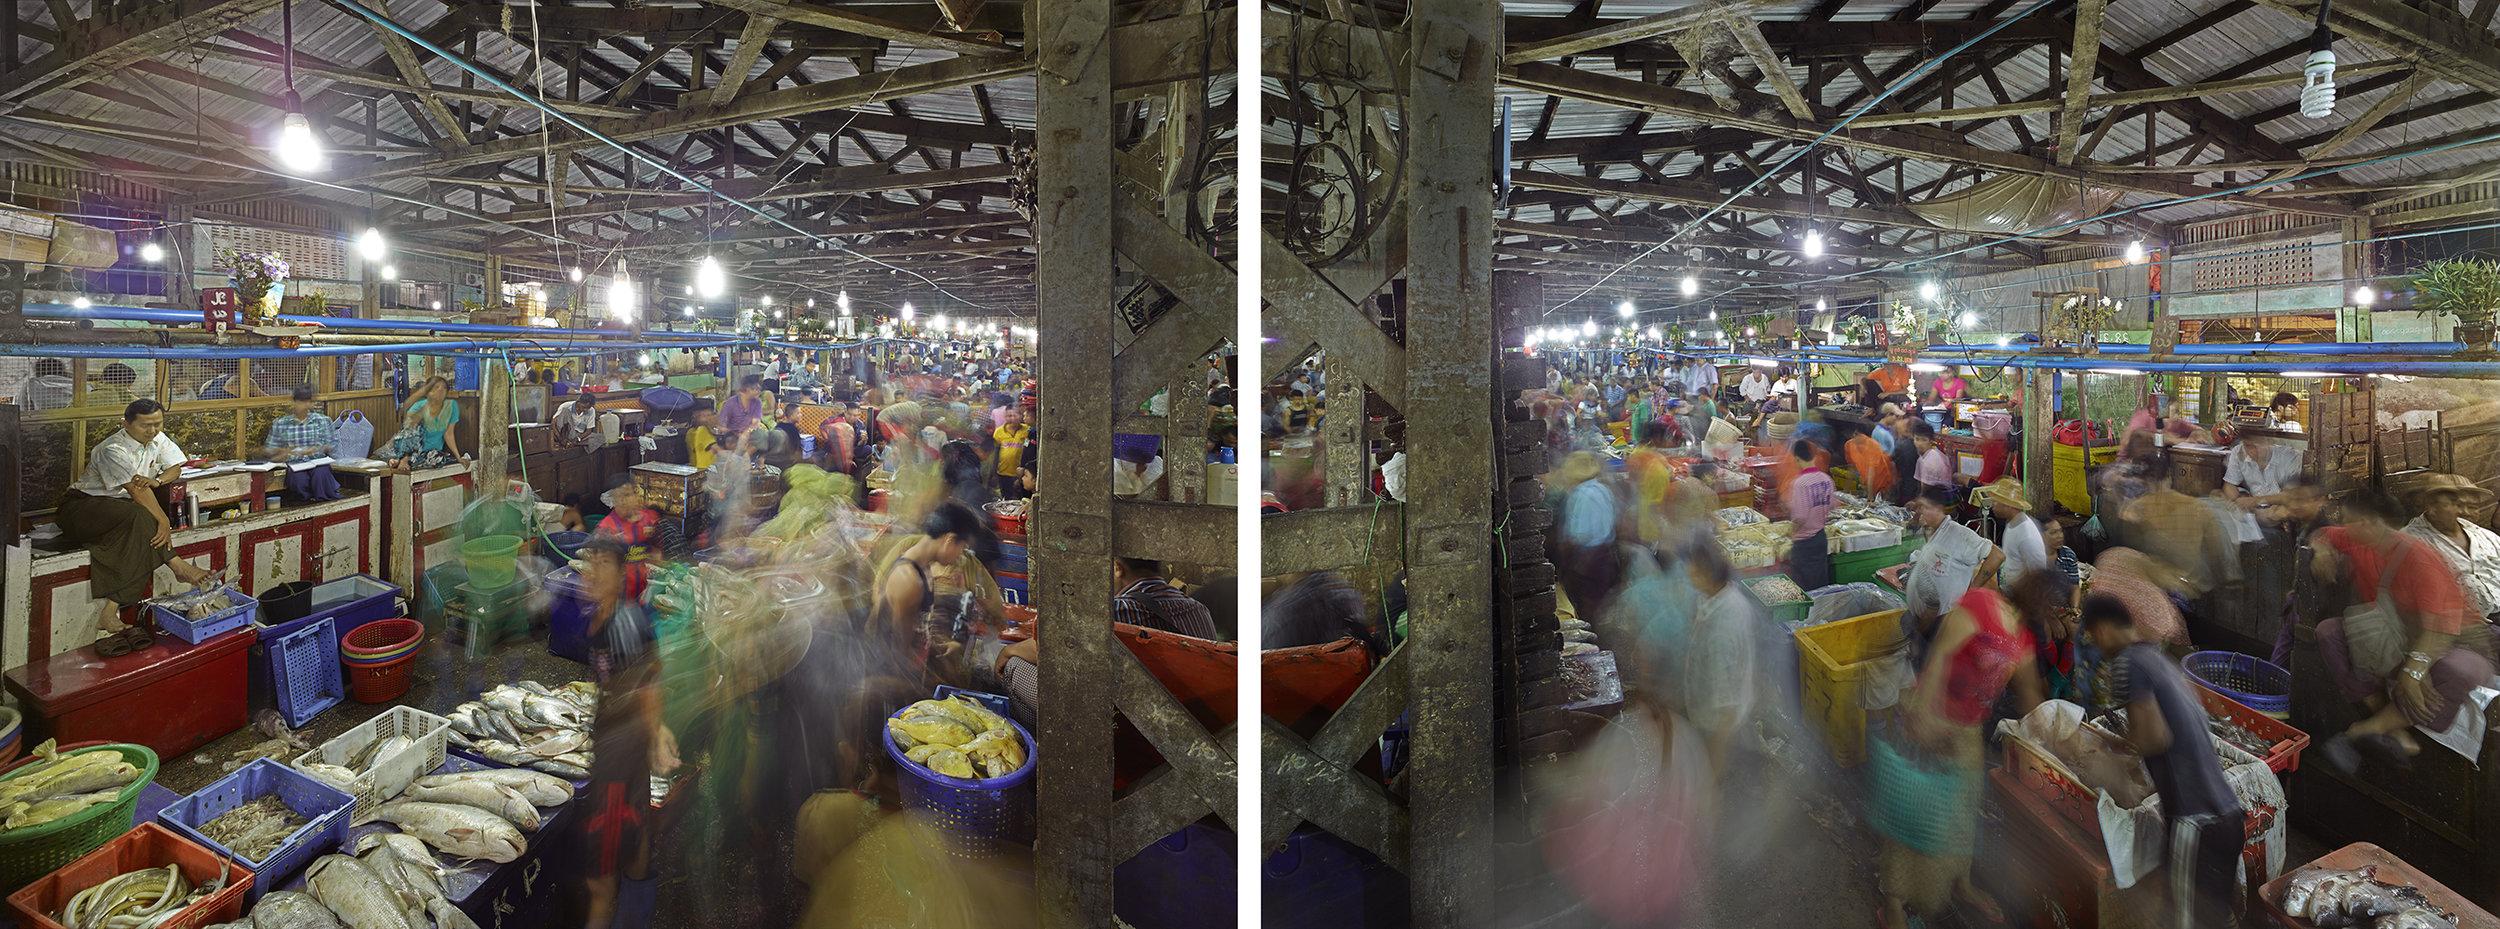 Fish Market, Yangon, Myanmar - 2013.jpg